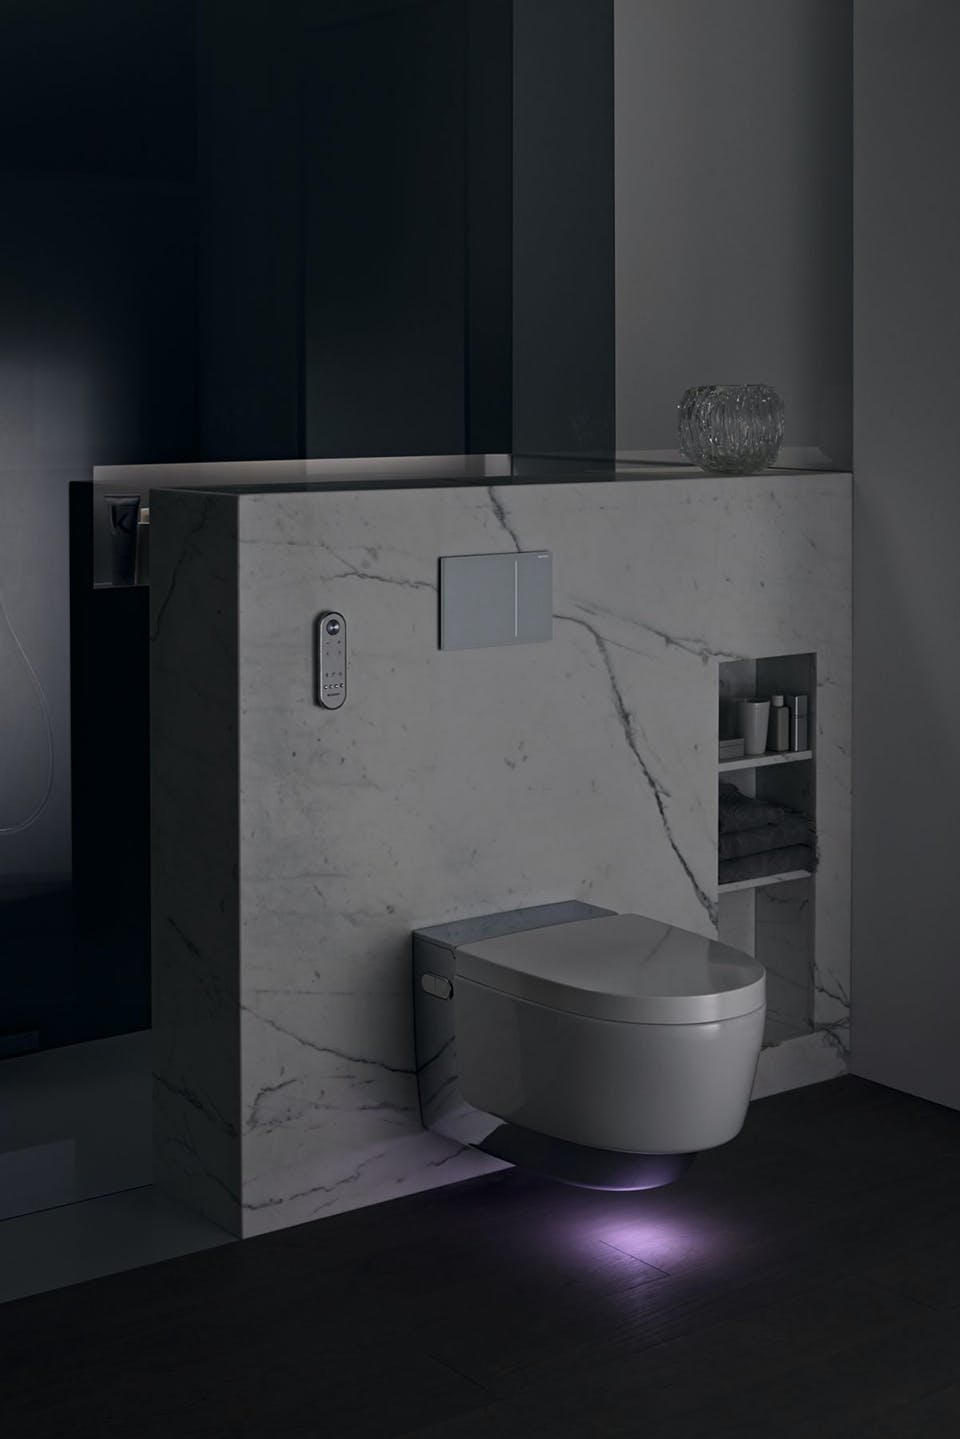 lys badeværelse nat geberit toilet aquaclean mera viser vej i mørket